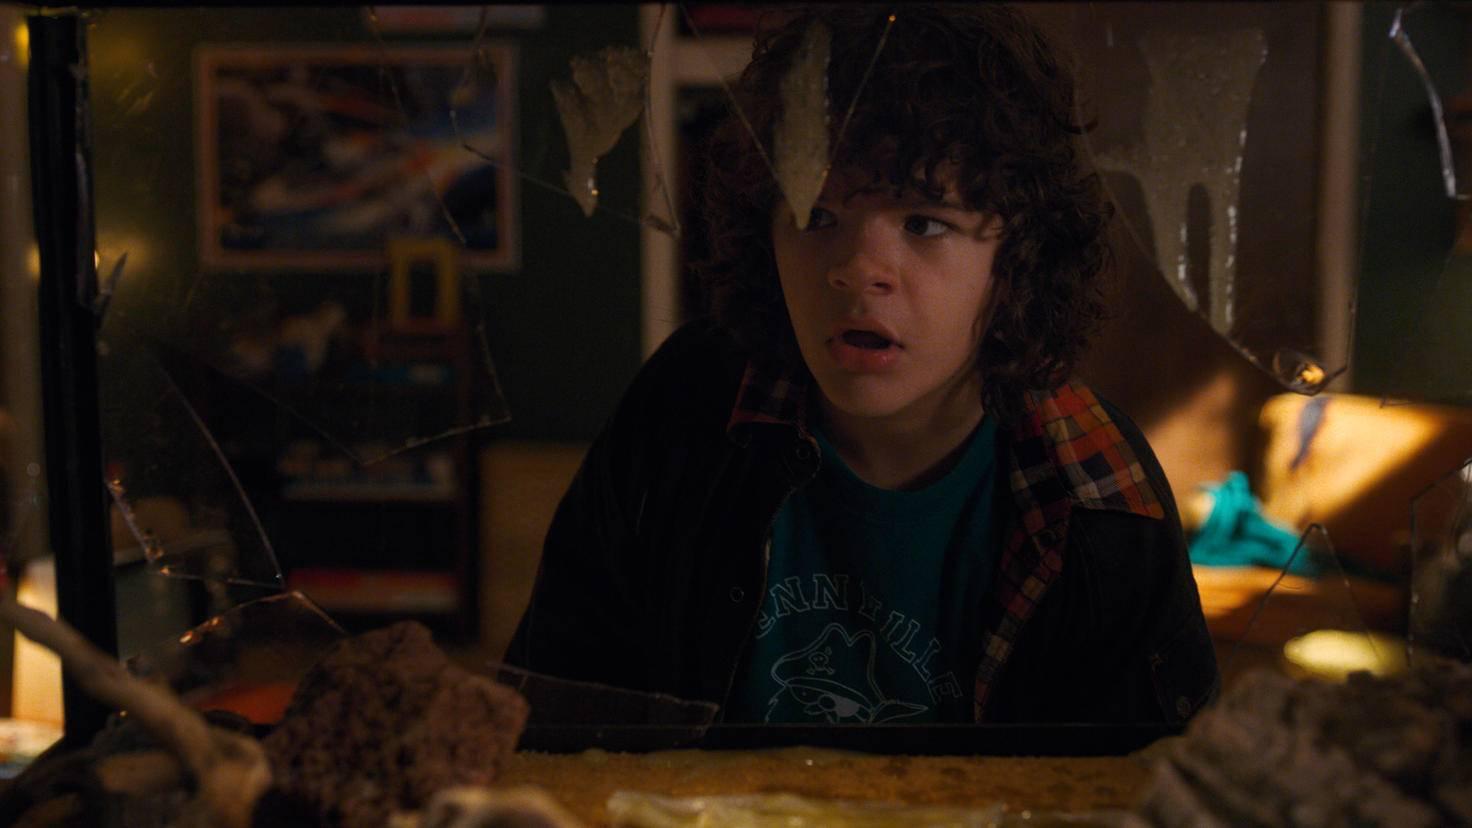 Gaten Matarazzo als Dustin in Stranger Things